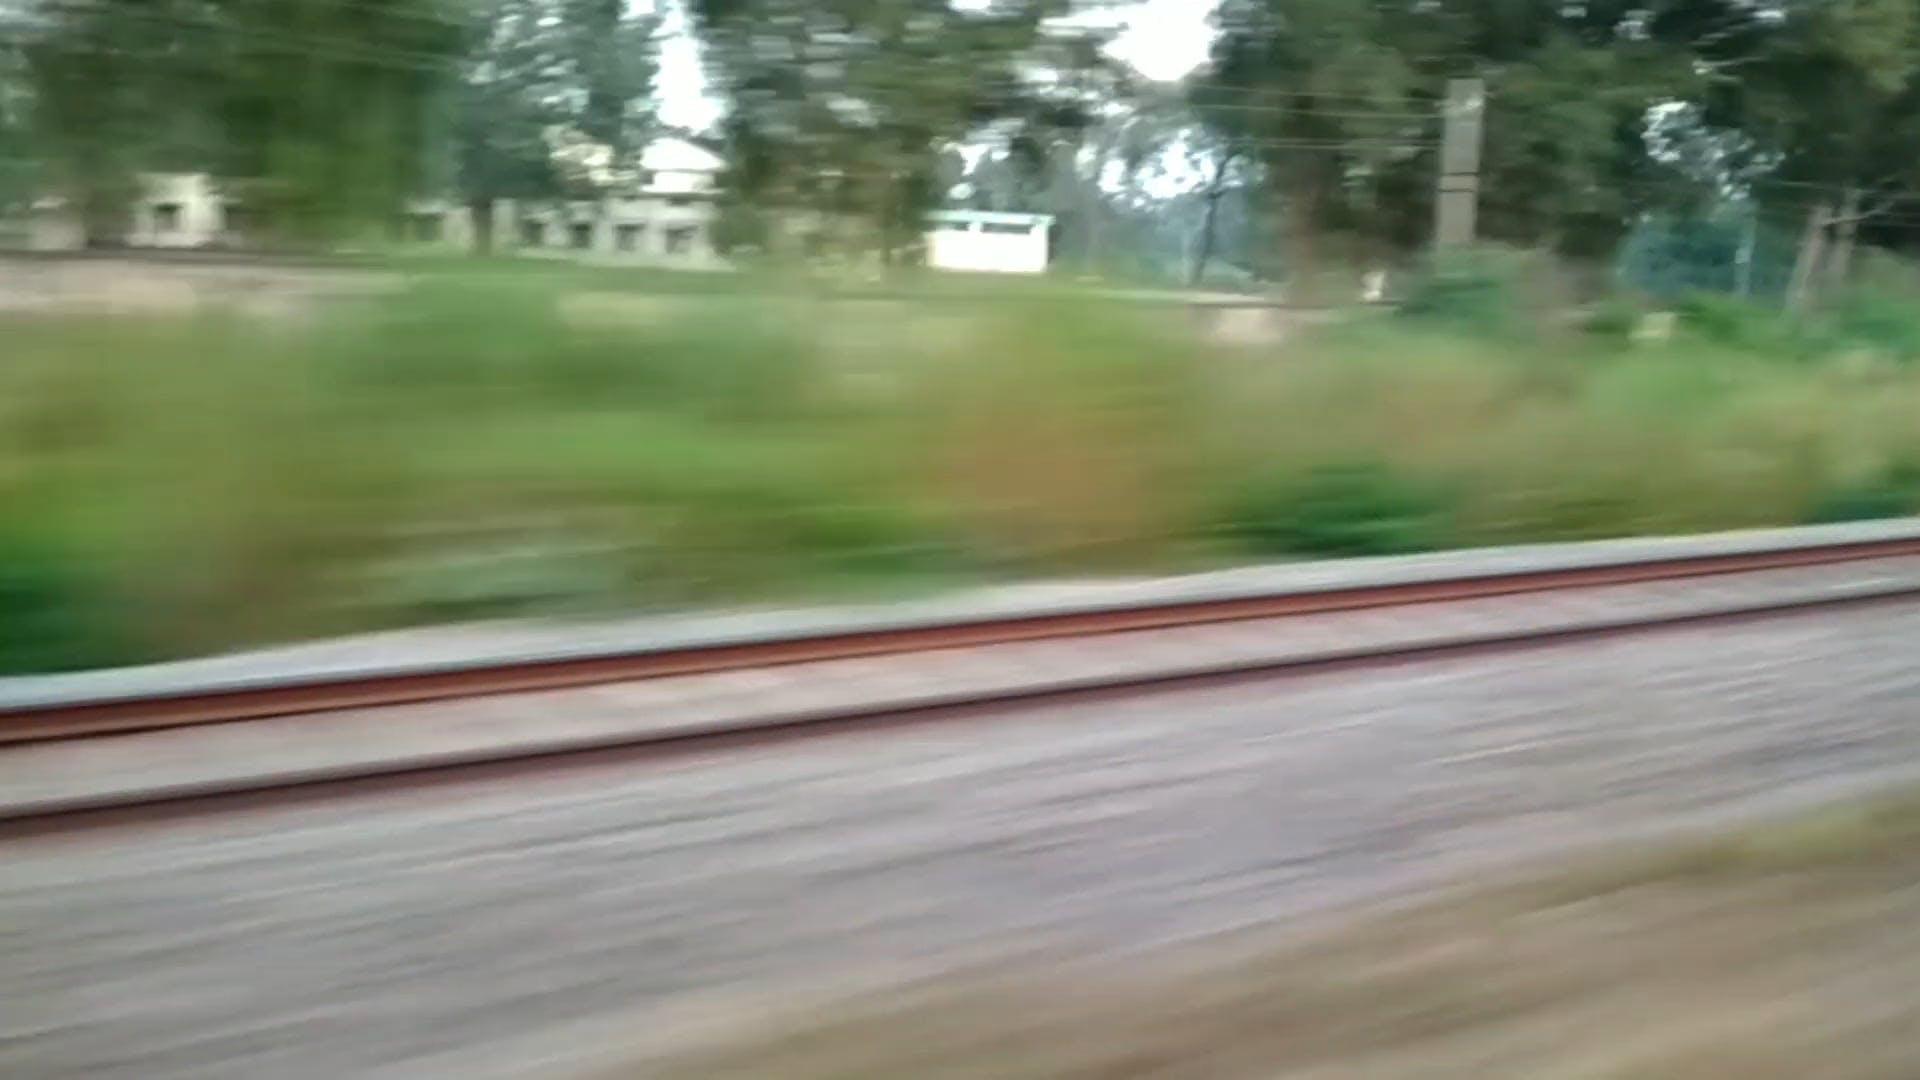 Video Of Railroad